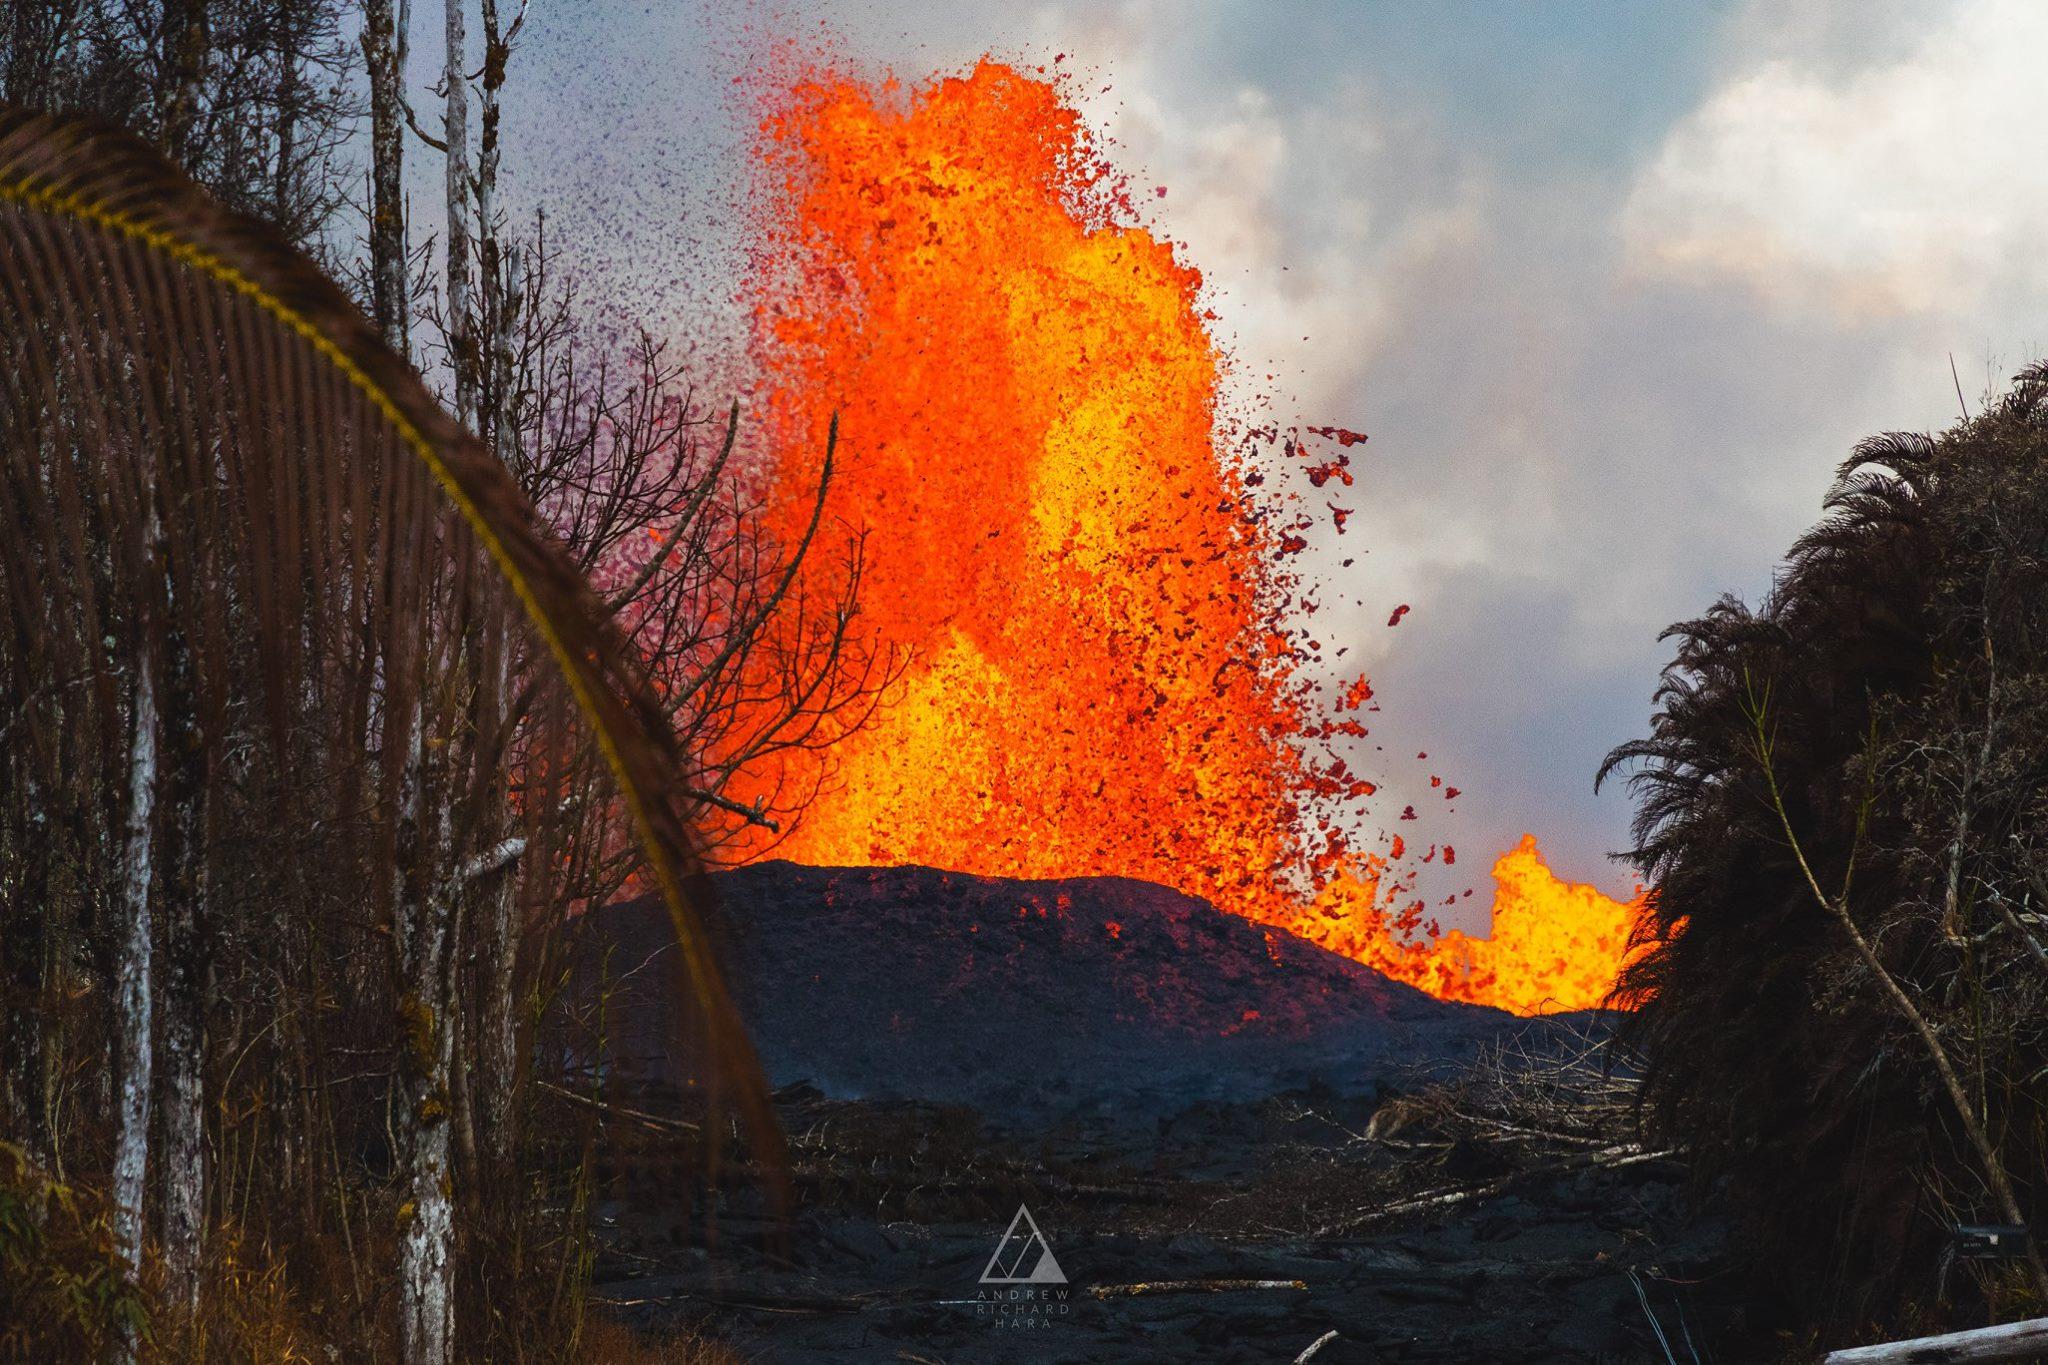 May 31 , 2018.  EN.  Pu'u 'Ō'ō / Kilauea , White Island (Whakaari) , Pacaya , Cerro Machin , Piton de la Fournaise .